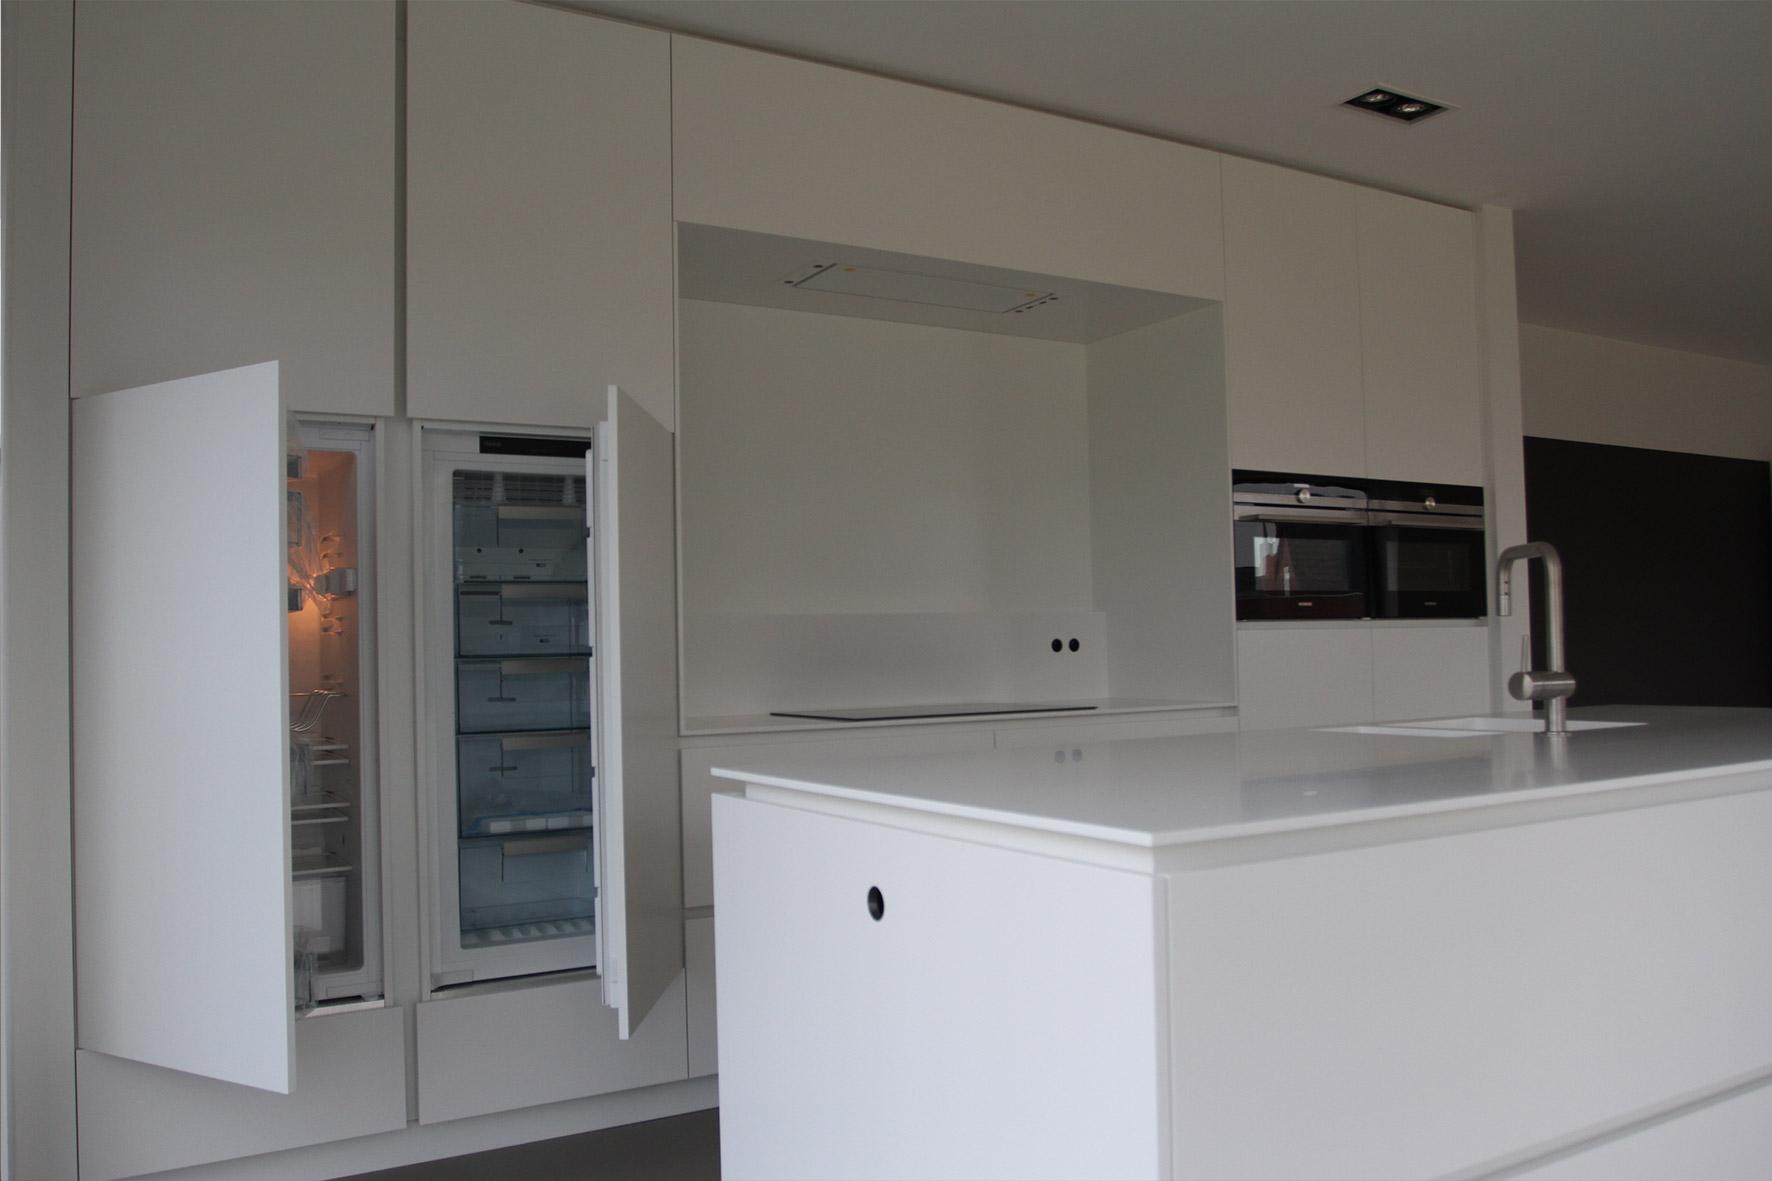 Creatief wand design diy - Model keuken wit gelakt ...